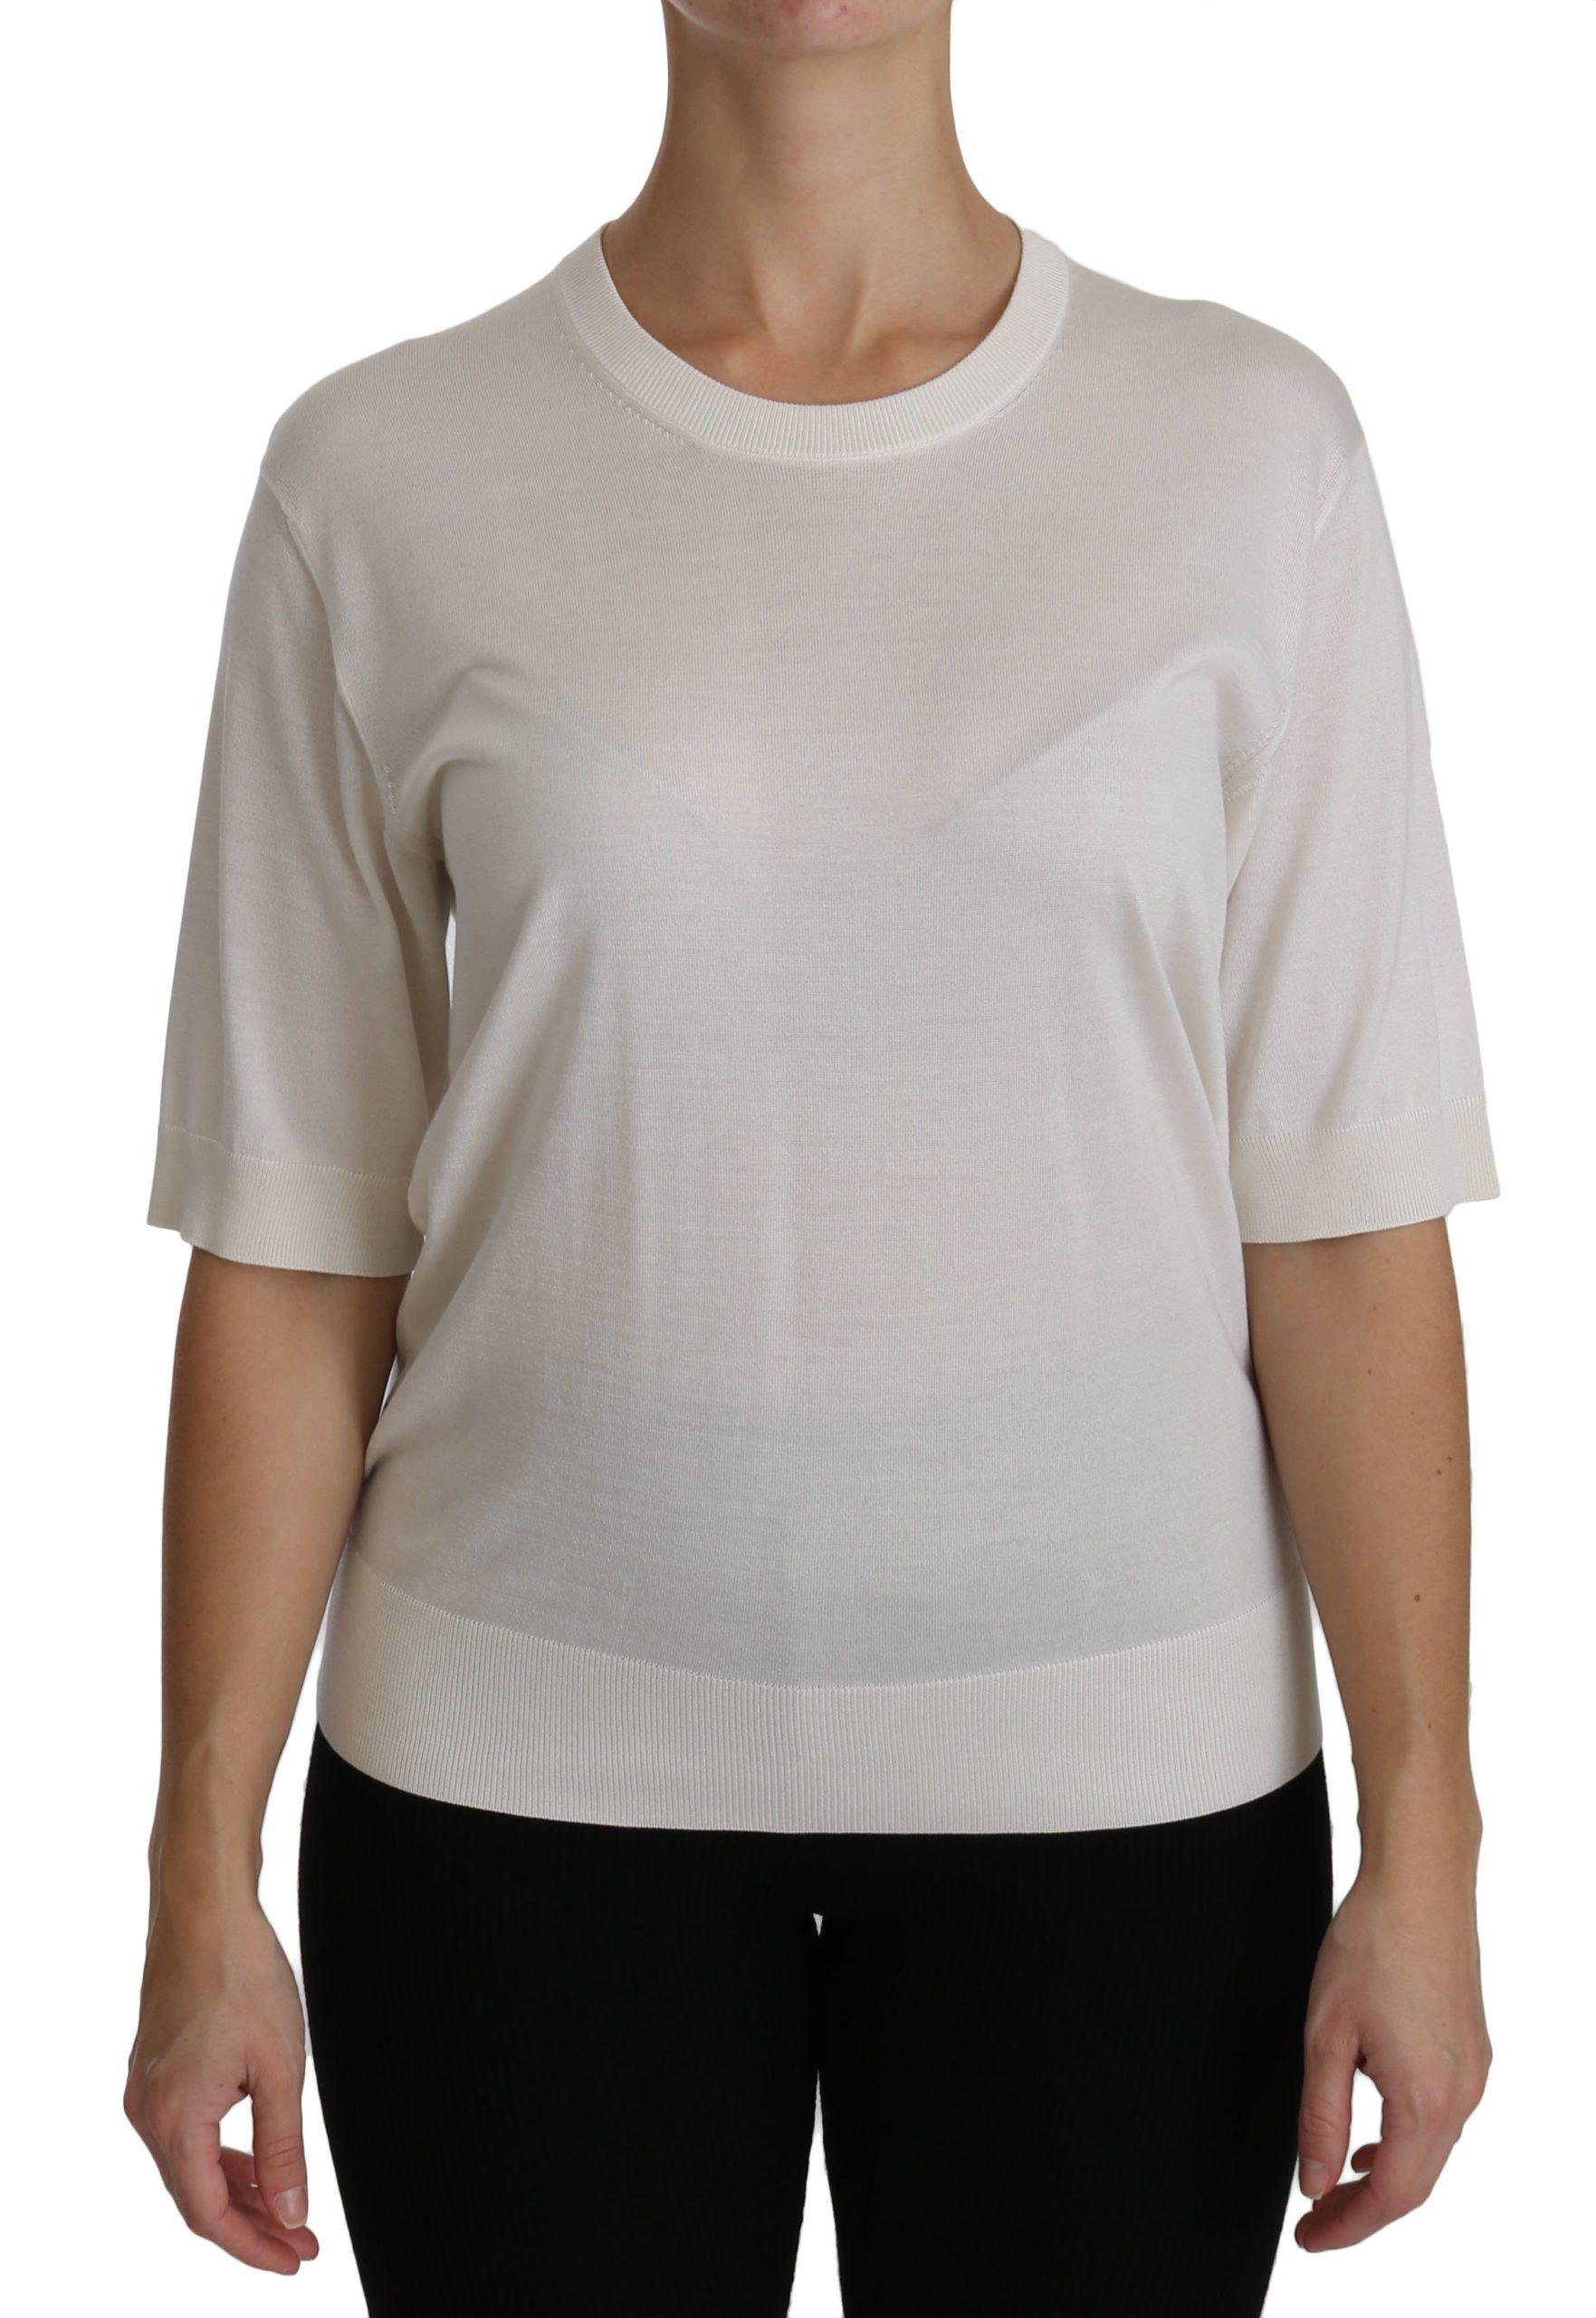 Dolce & Gabbana Women's Crew Neck Short Sleeve Top White TSH4265 - IT40|S